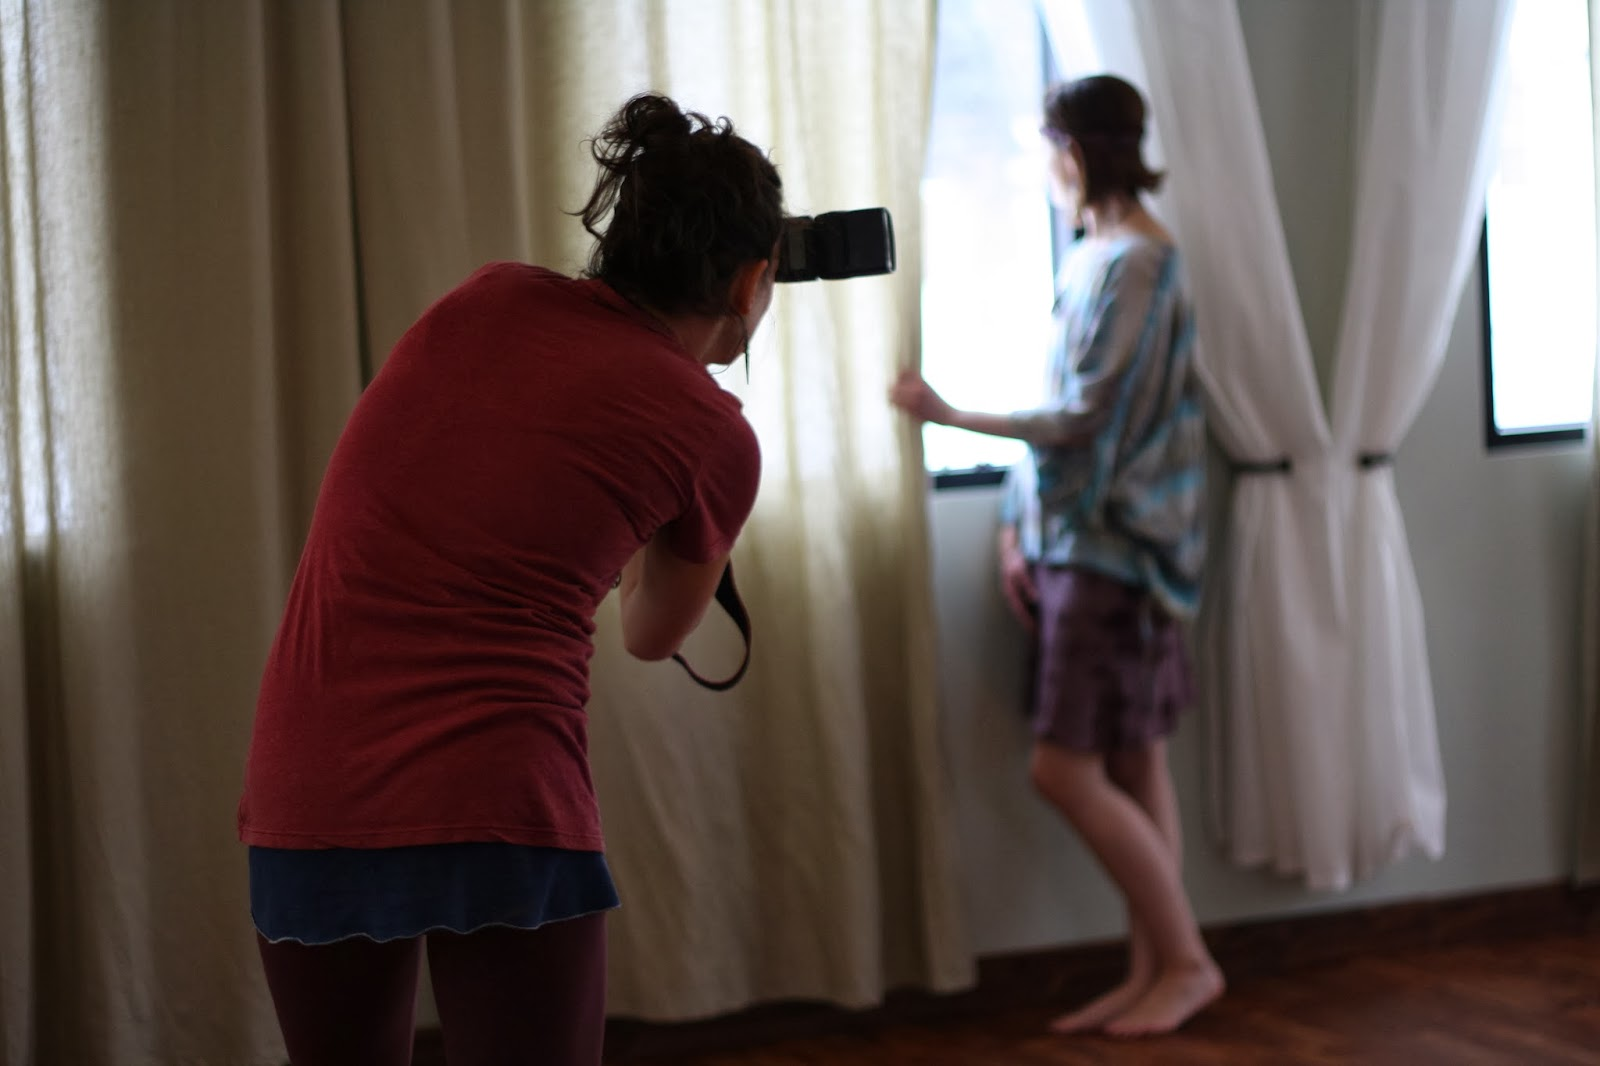 yoga+inspiration - Yoga Shoot: Behind the Scenes